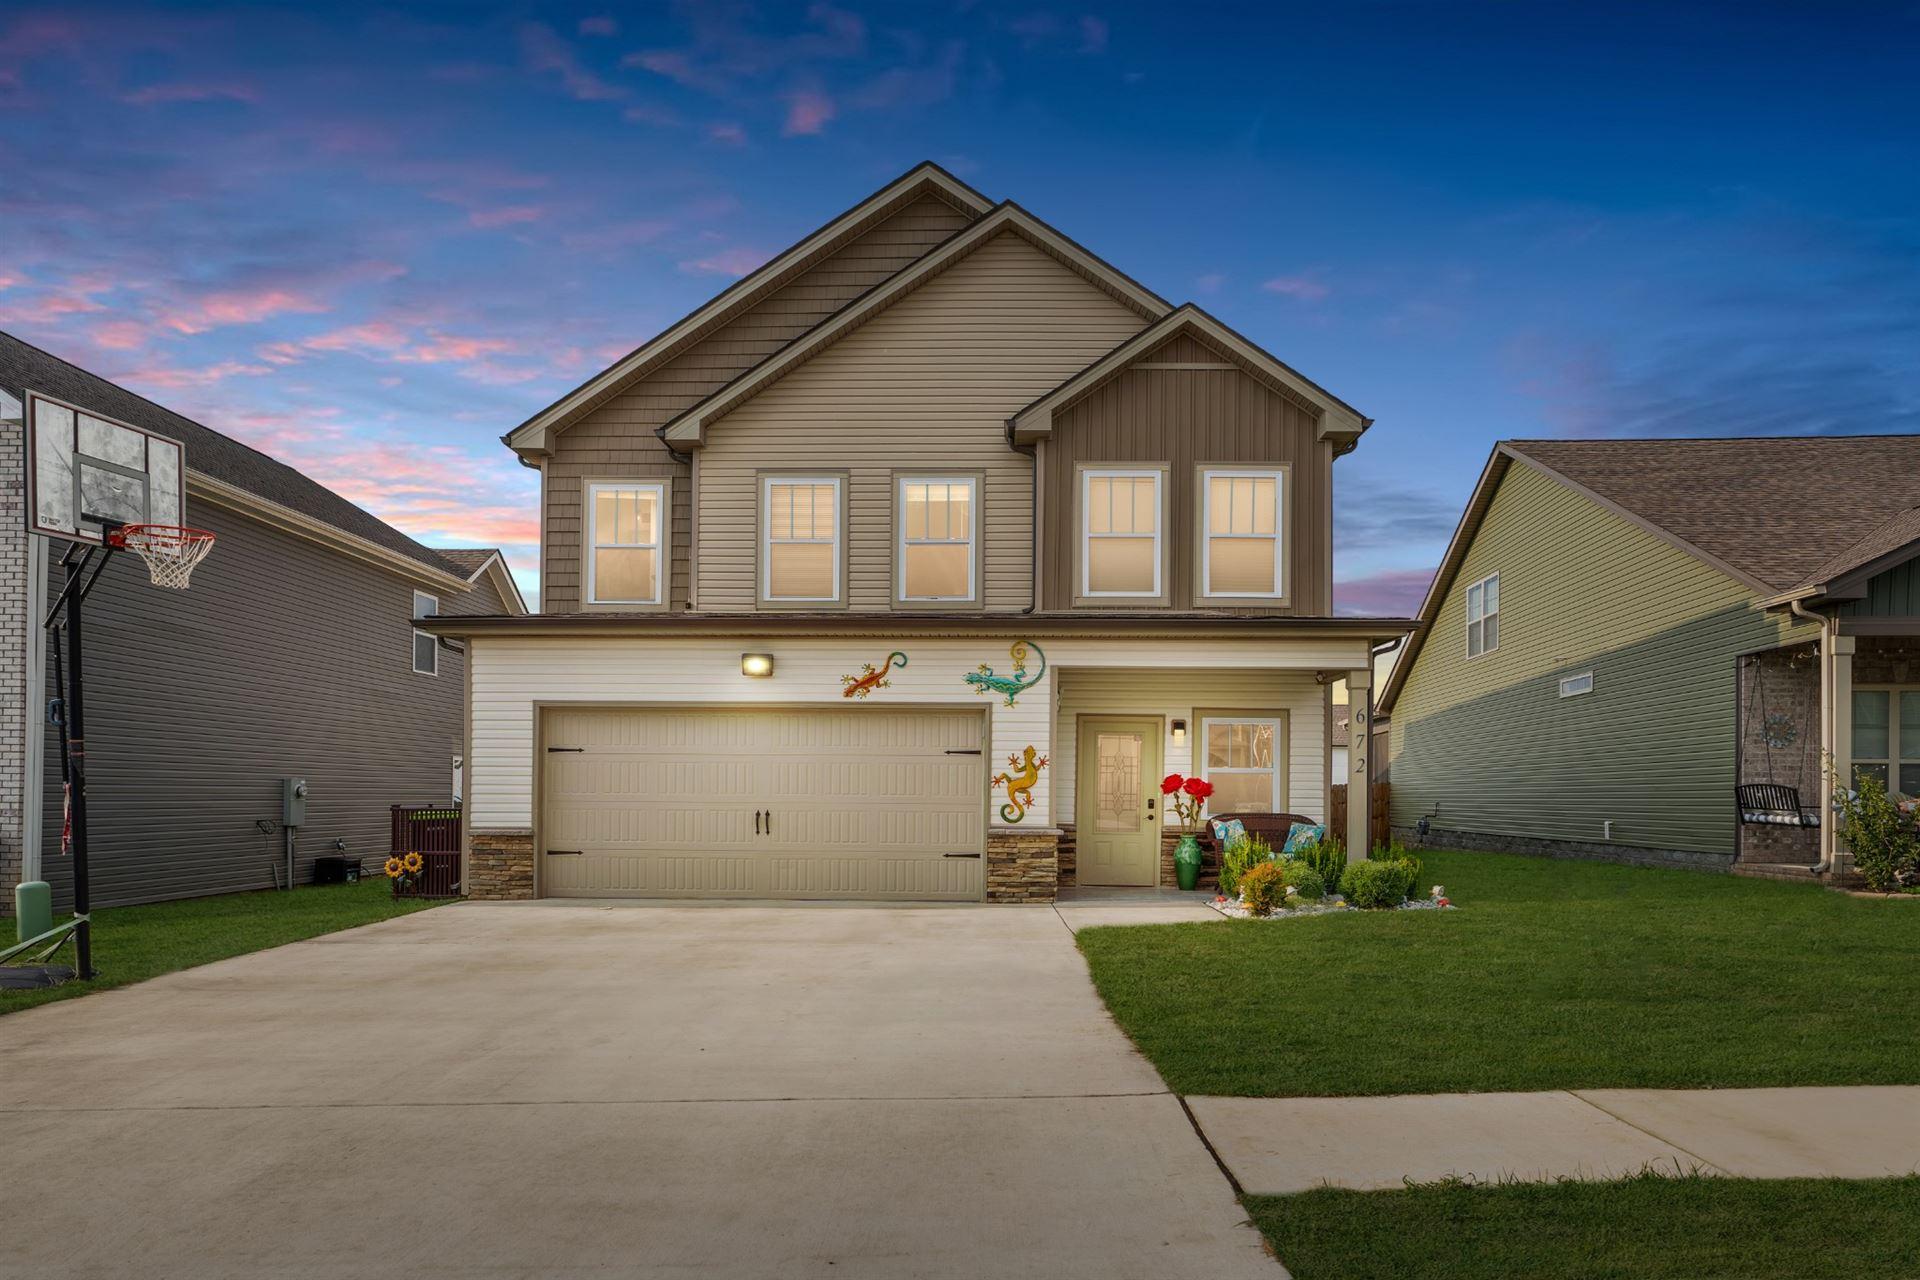 672 Elm St, Clarksville, TN 37040 - MLS#: 2289202